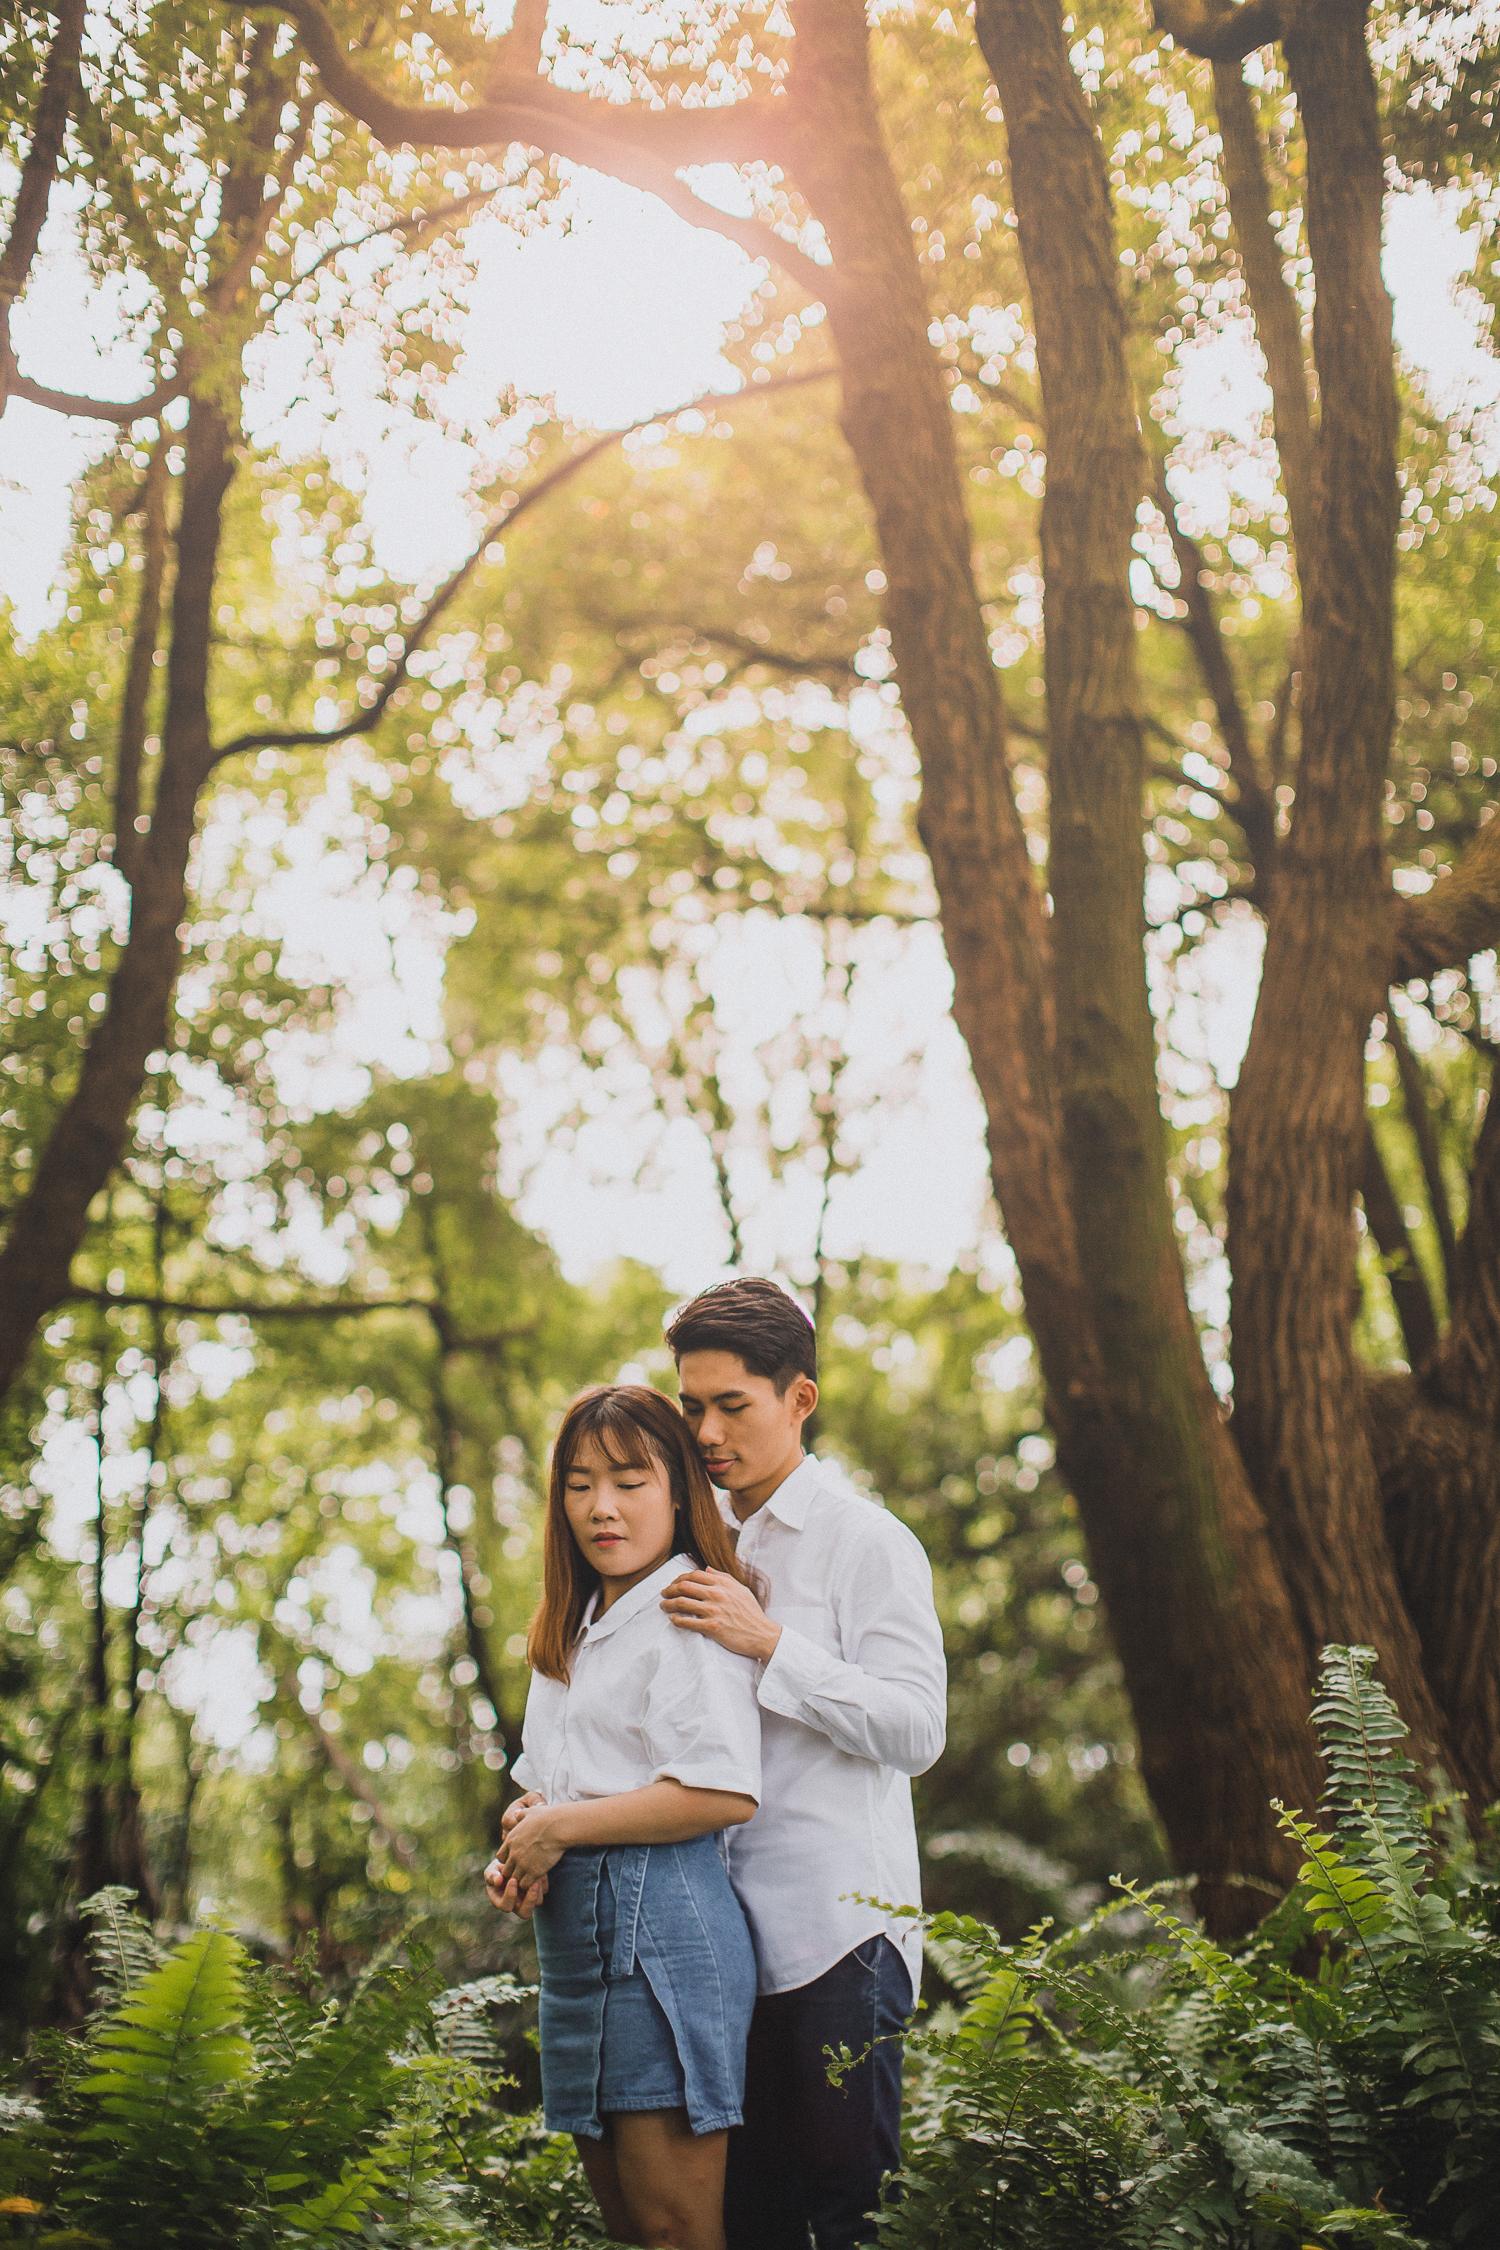 Singapore+Wedding+Photographer+Pre-Wedding+Couple+Zhiyu+Huimin-0015.jpg